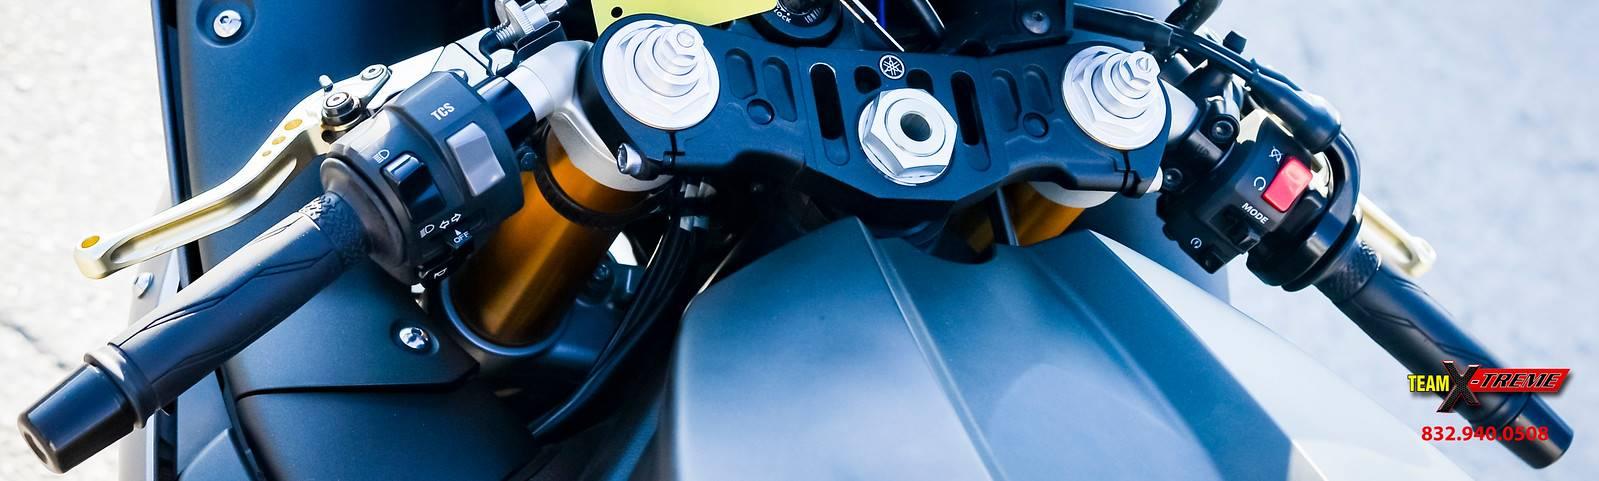 2014 Yamaha YZF-R1 12